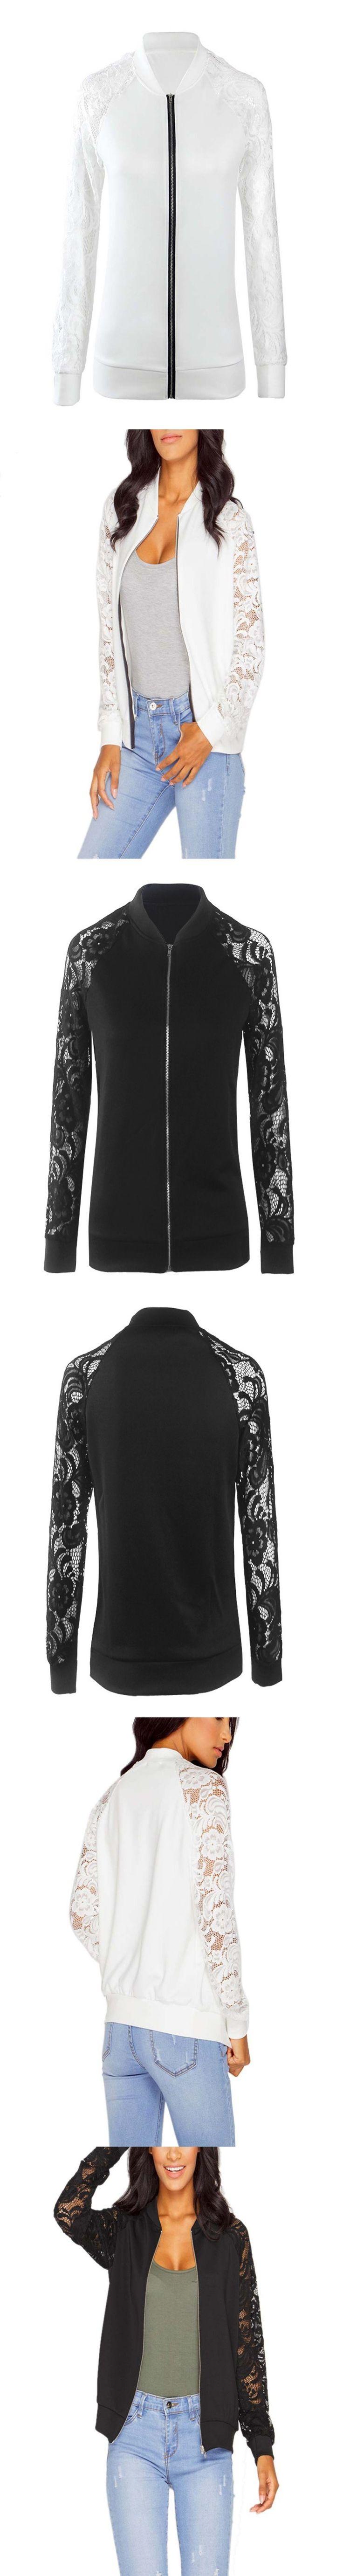 2016 Bomber Jacket Women Basic Suit Coats Fashion Lace Long Sleeve Zipper Solid Black White Short Jackets Outwear S1